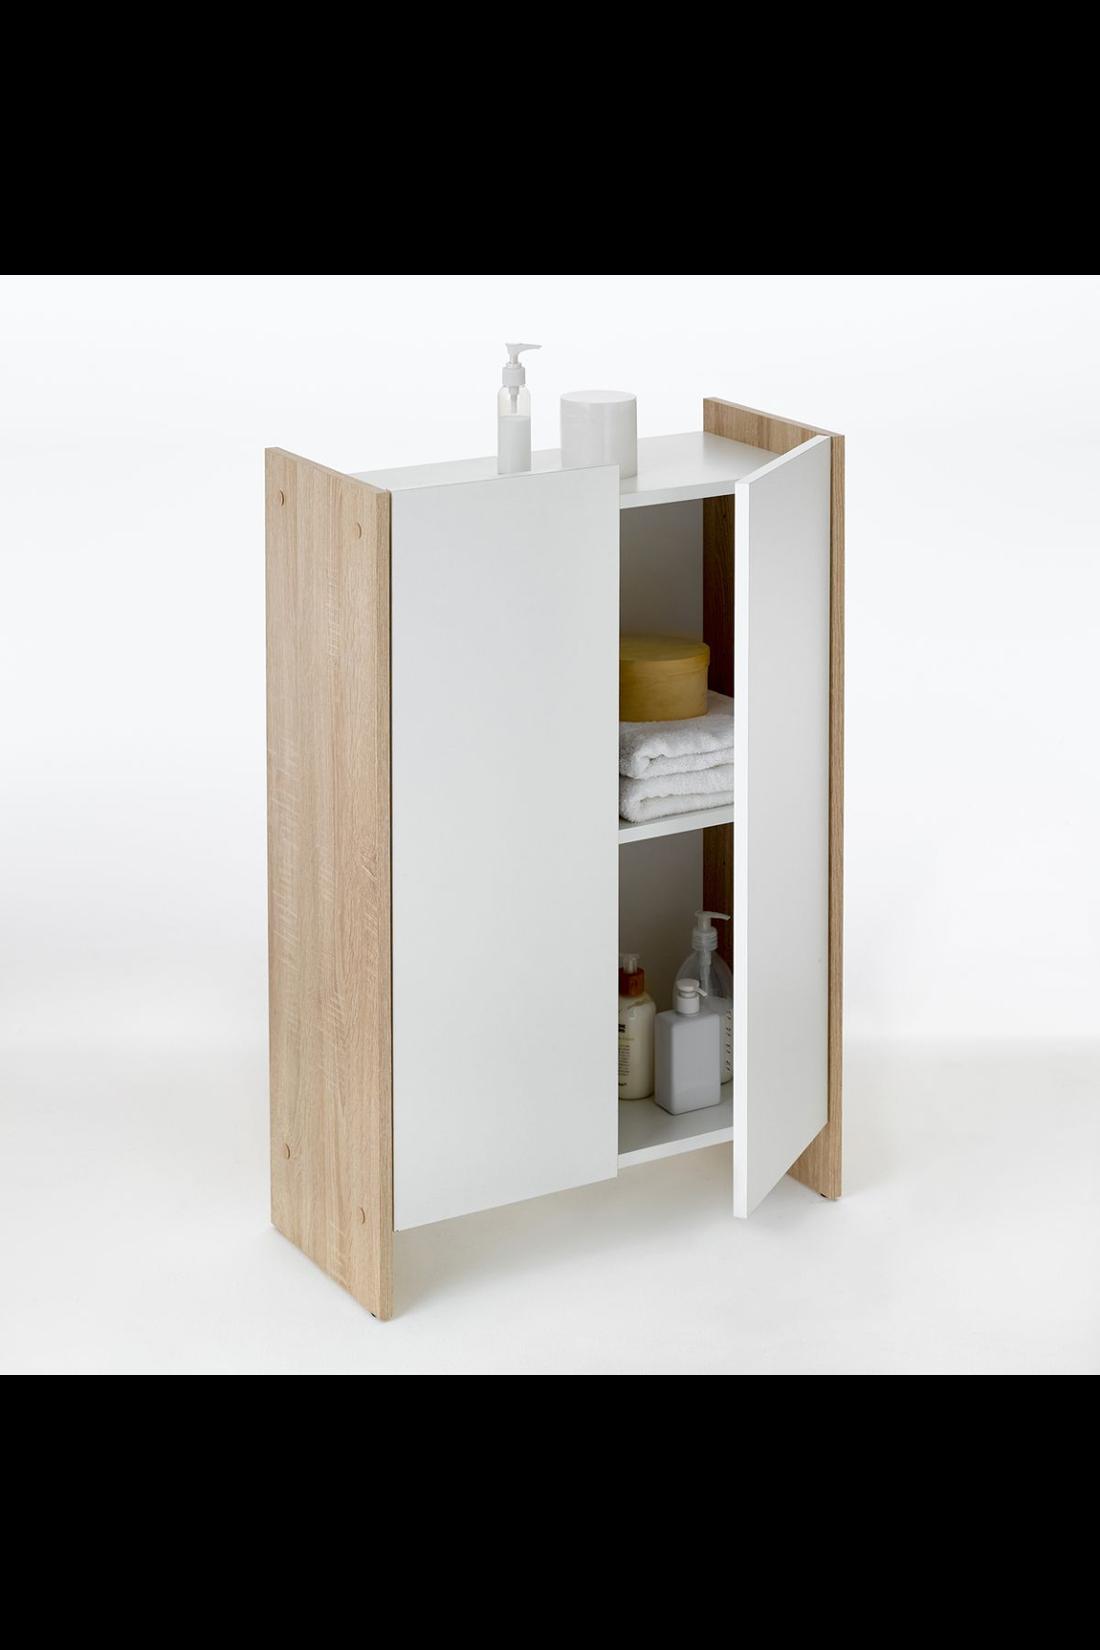 meuble de salle de bain 2 portes mobler home. Black Bedroom Furniture Sets. Home Design Ideas